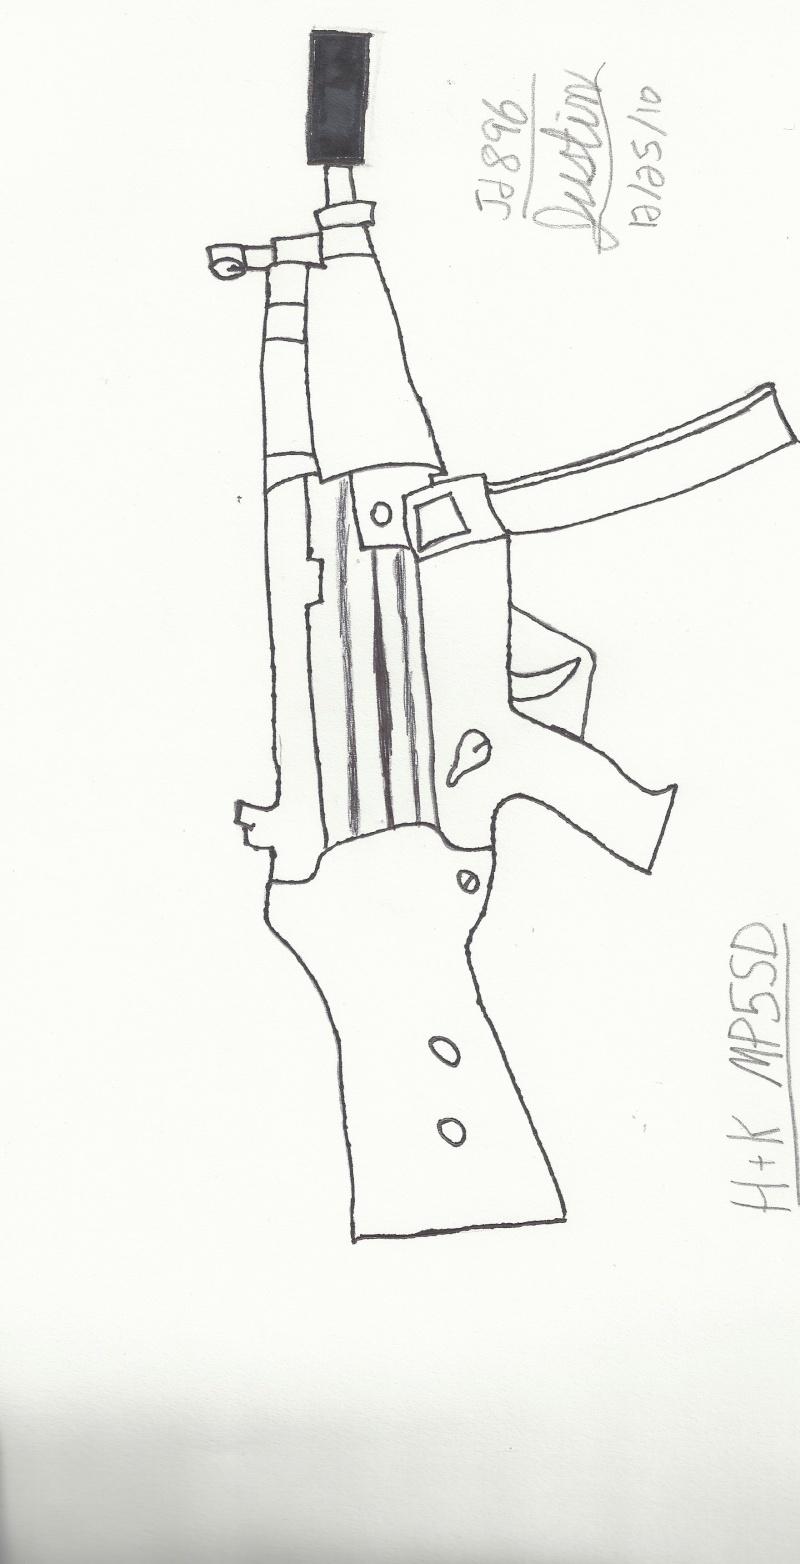 Jd896's Random Art Scan0019